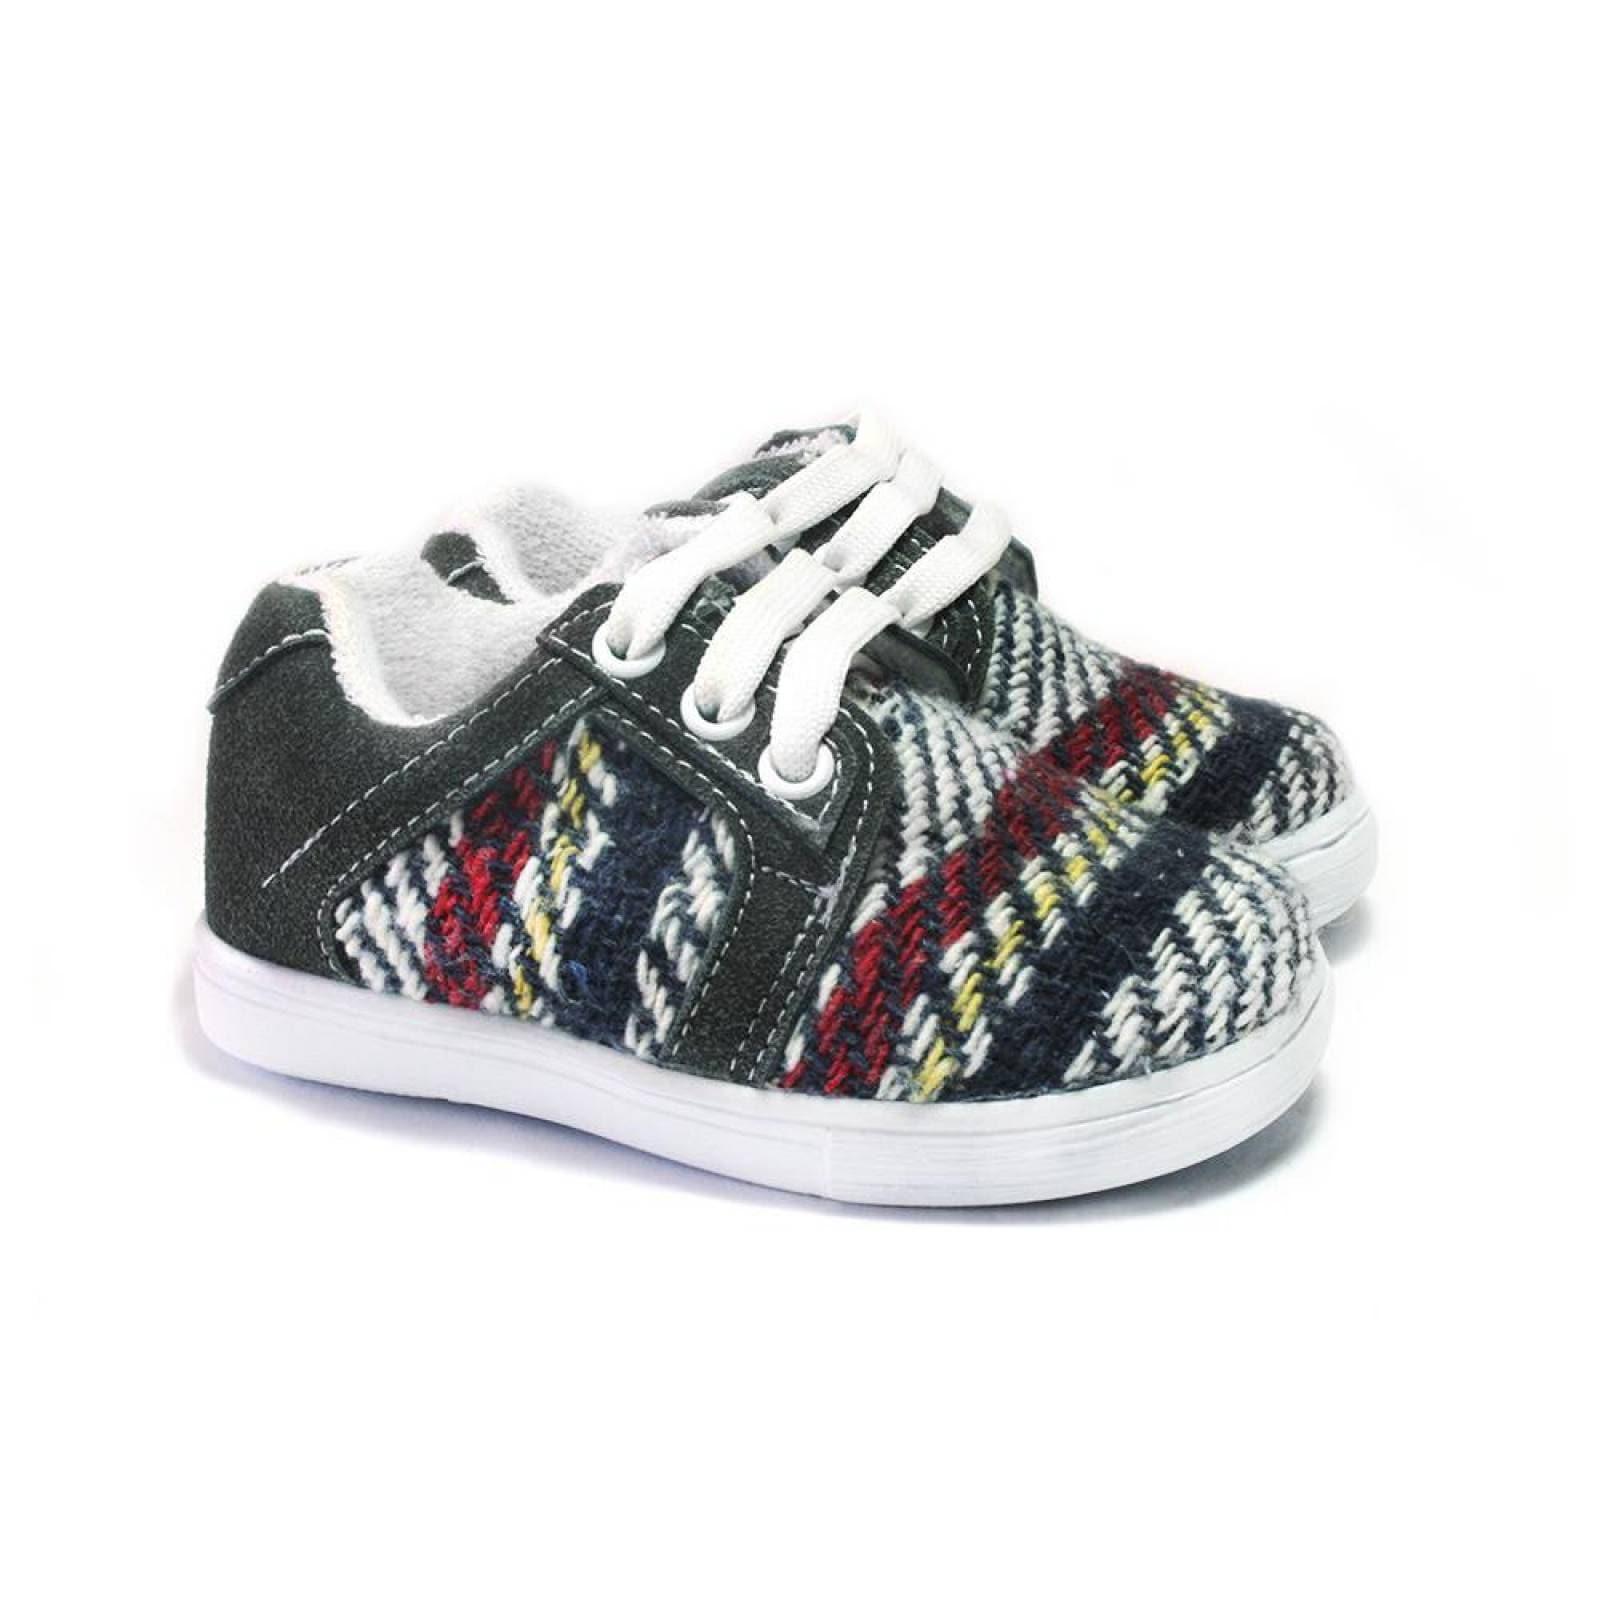 Tenis Zapato Casual Mini Simon Artesanal Infantil Gris Komoni Talla: 17